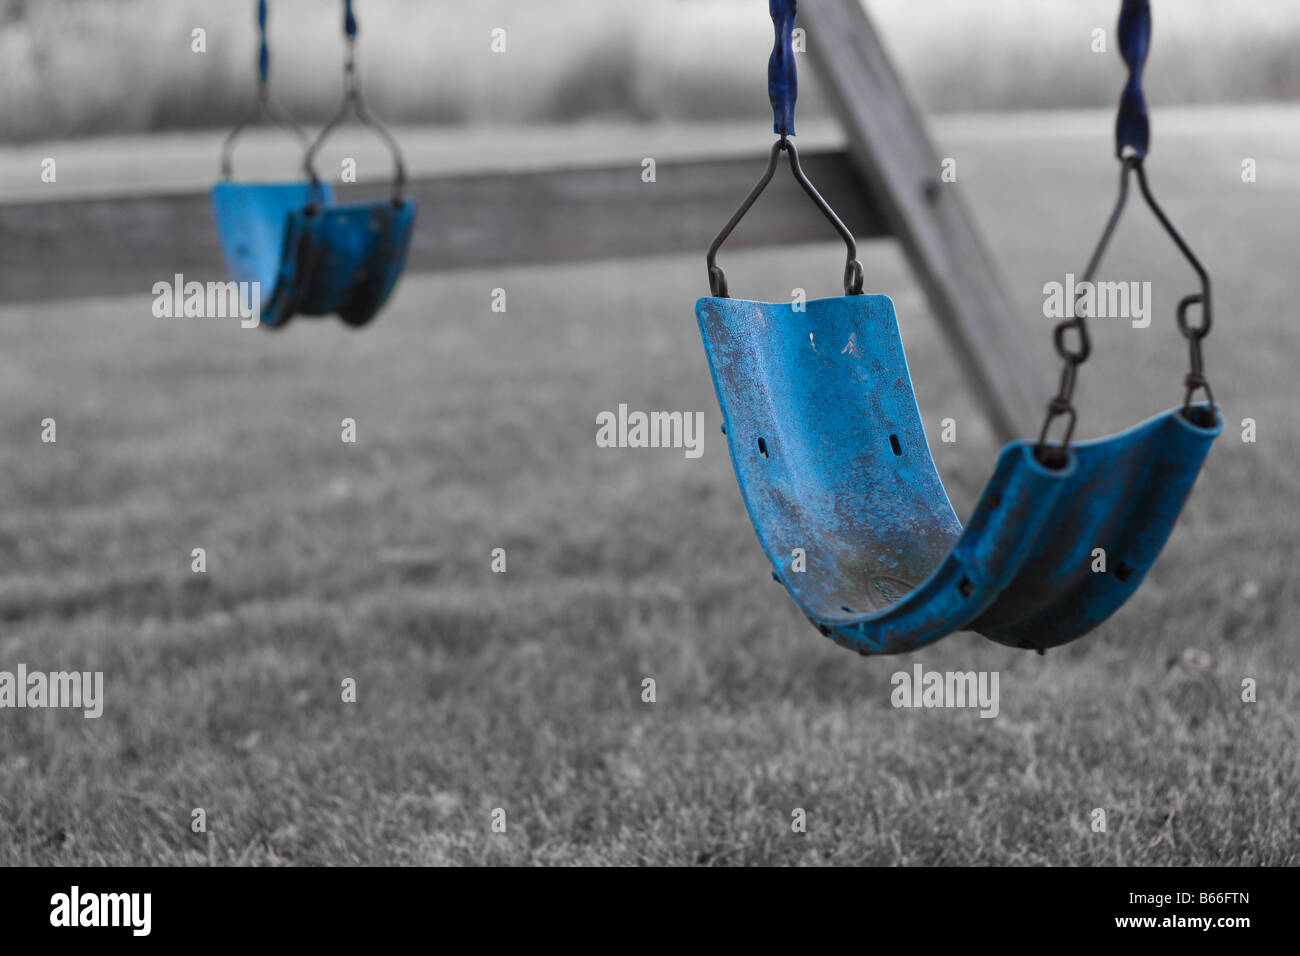 Swing set. - Stock Image